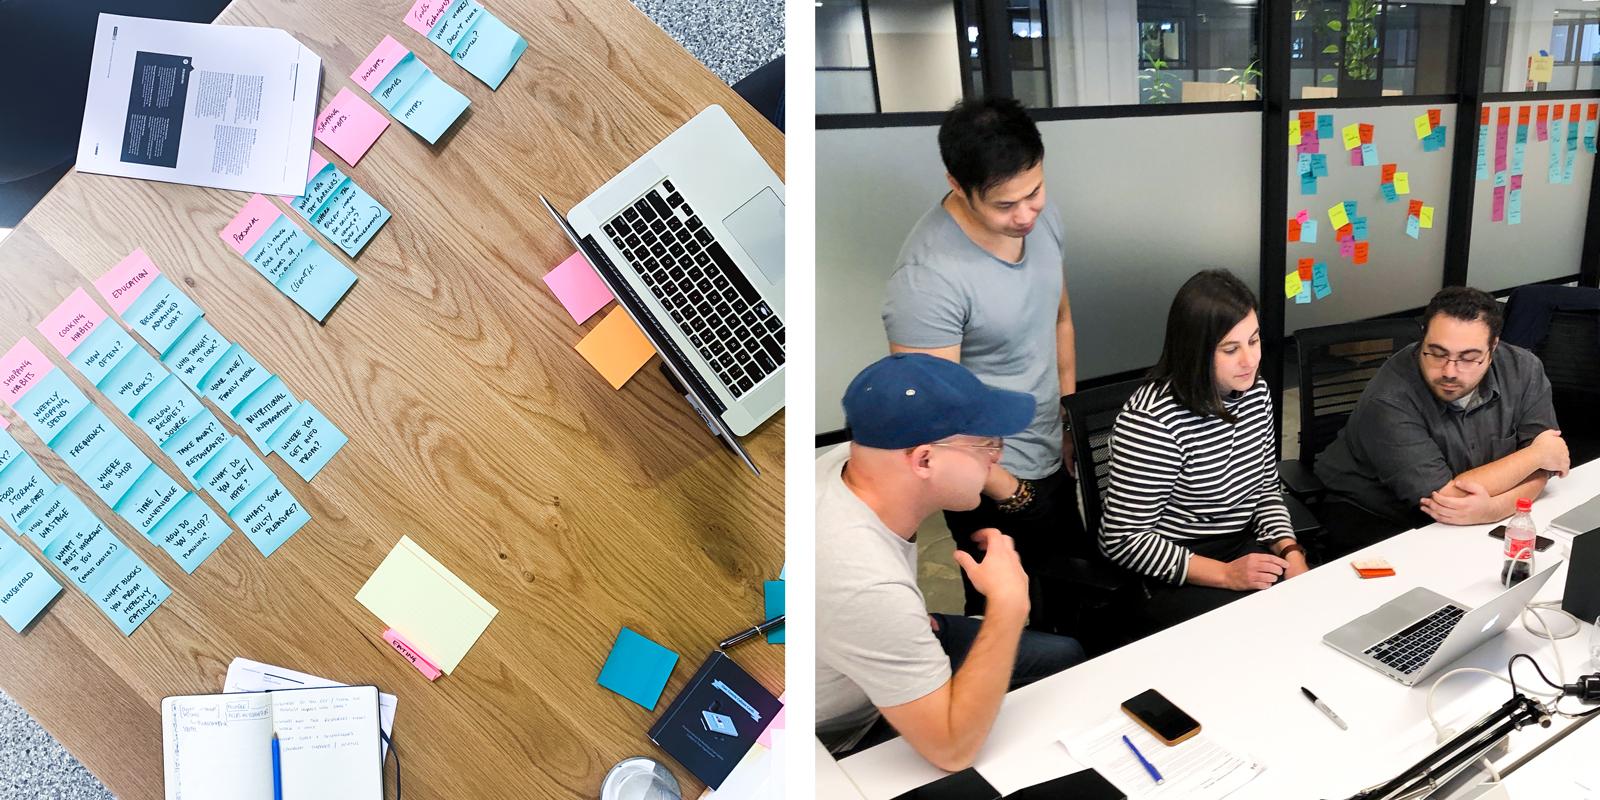 Design-thinking groups